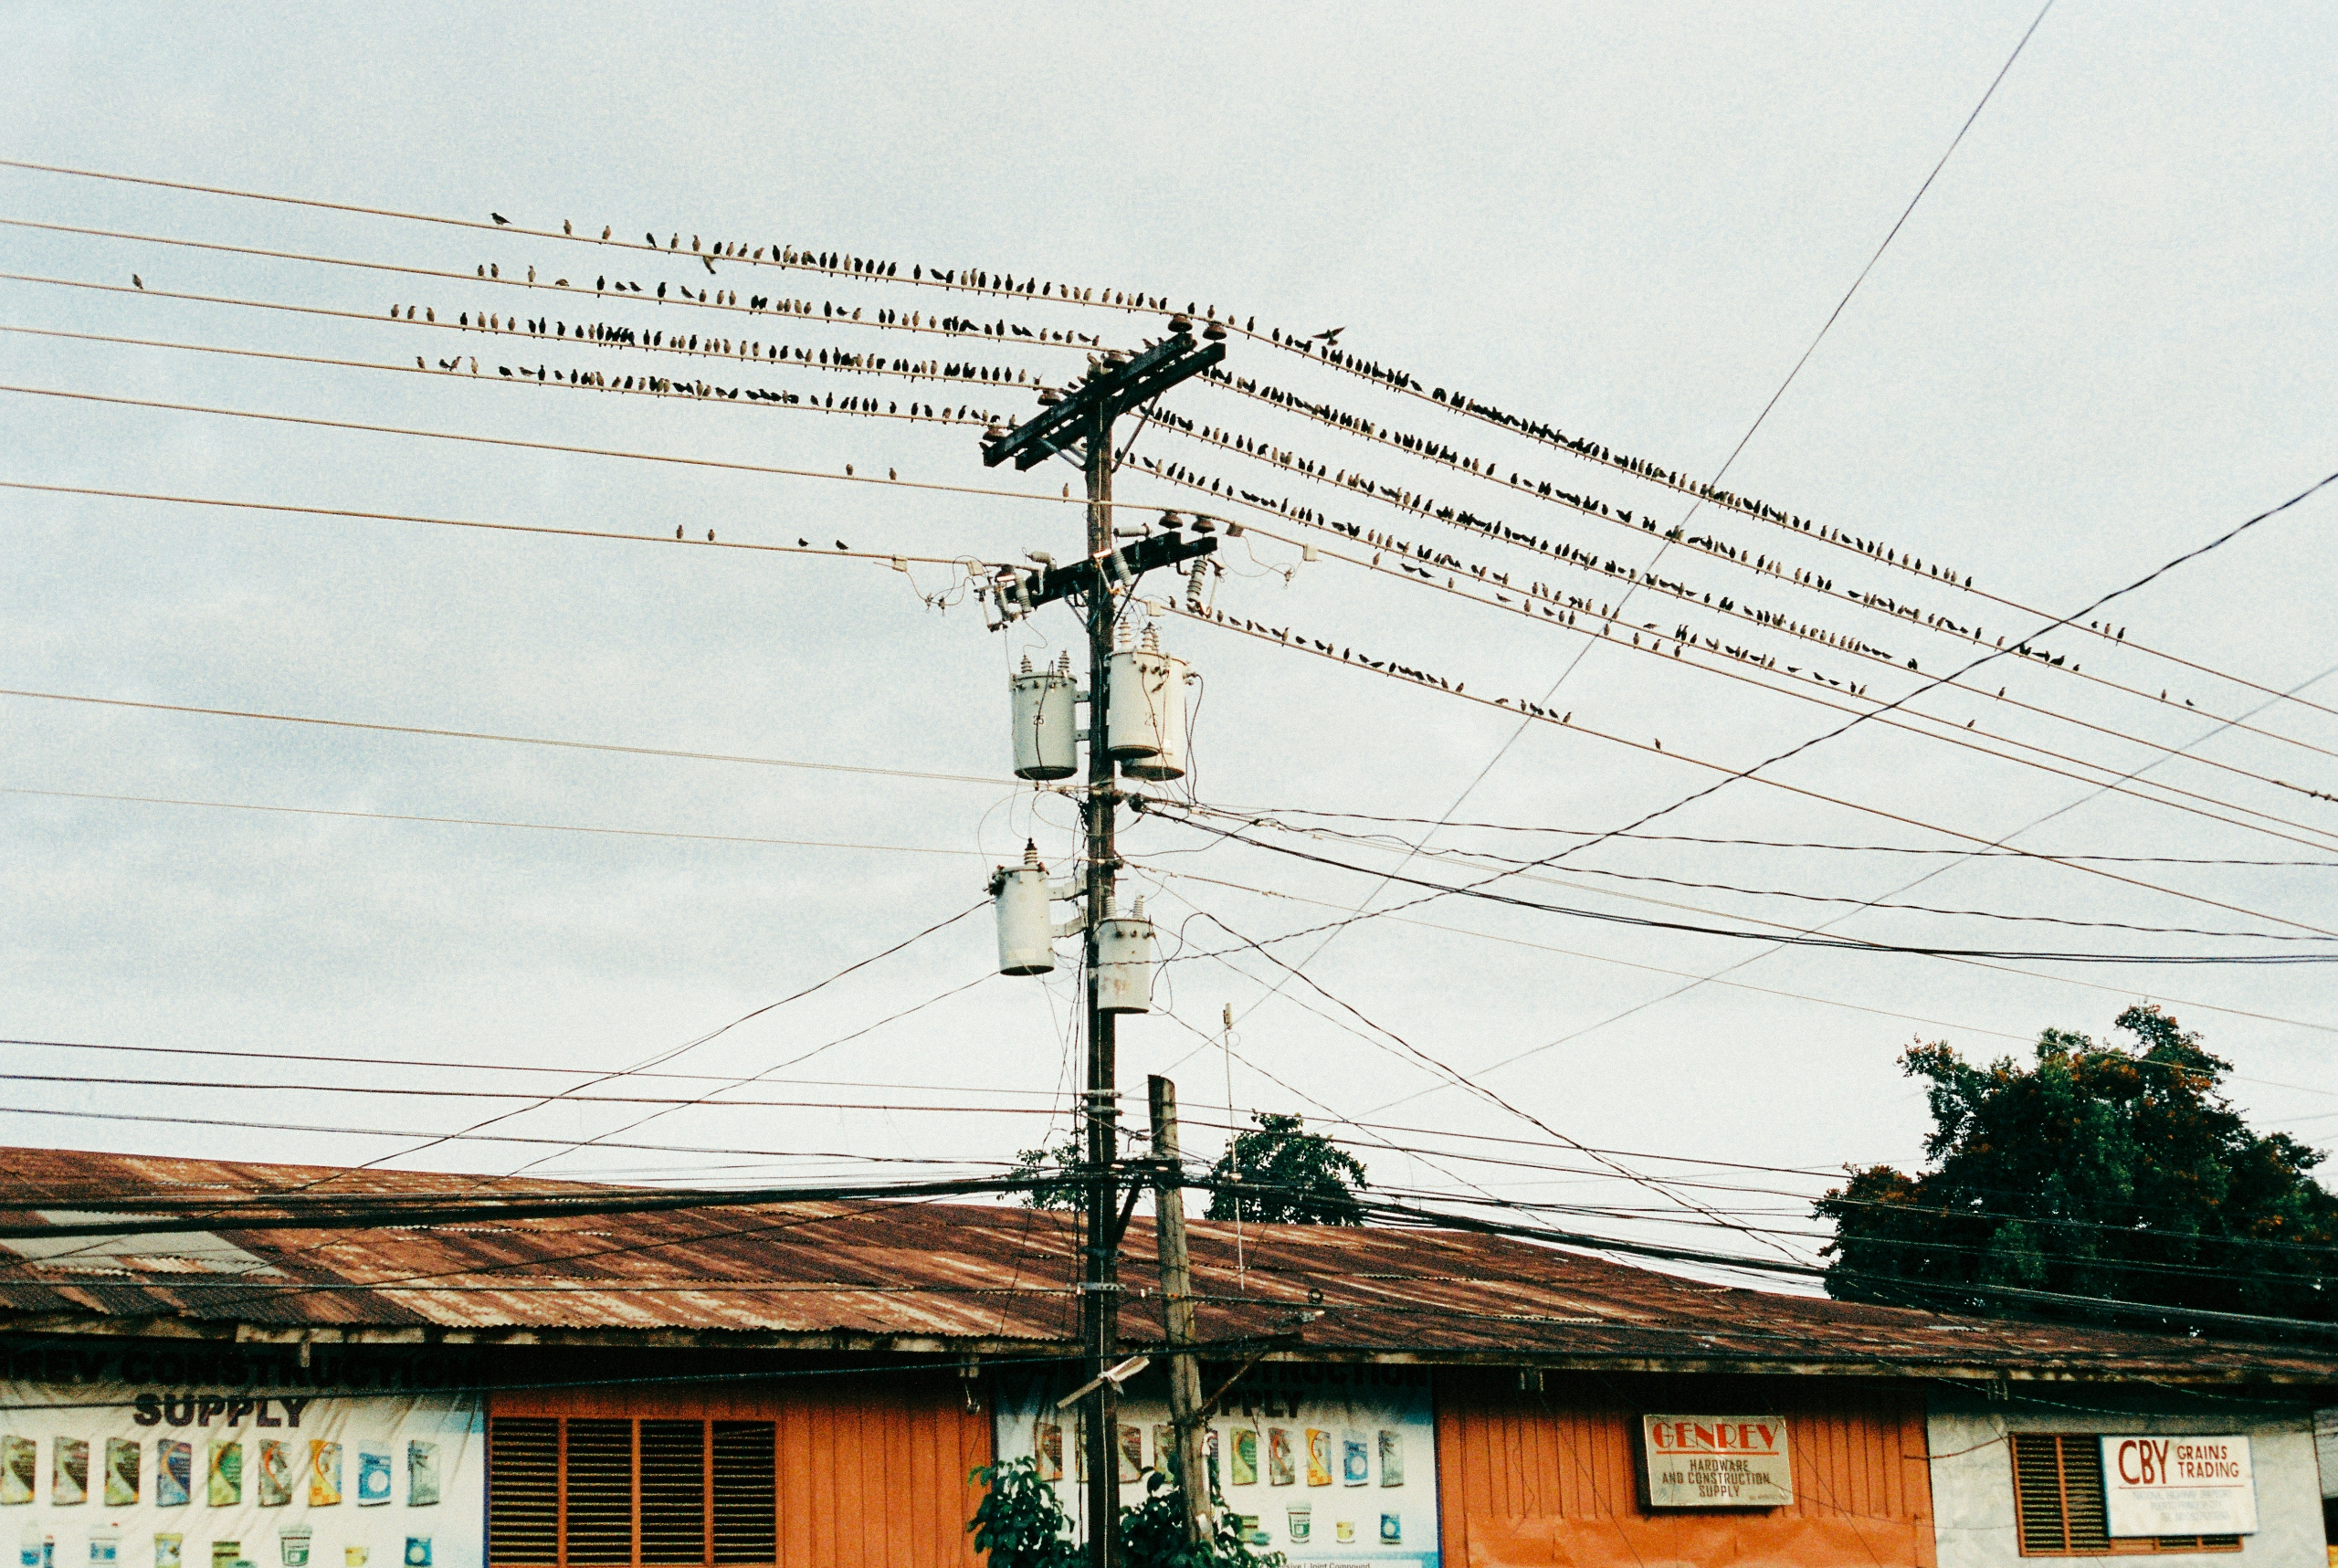 birds hablofilipino photography - mrjose | ello